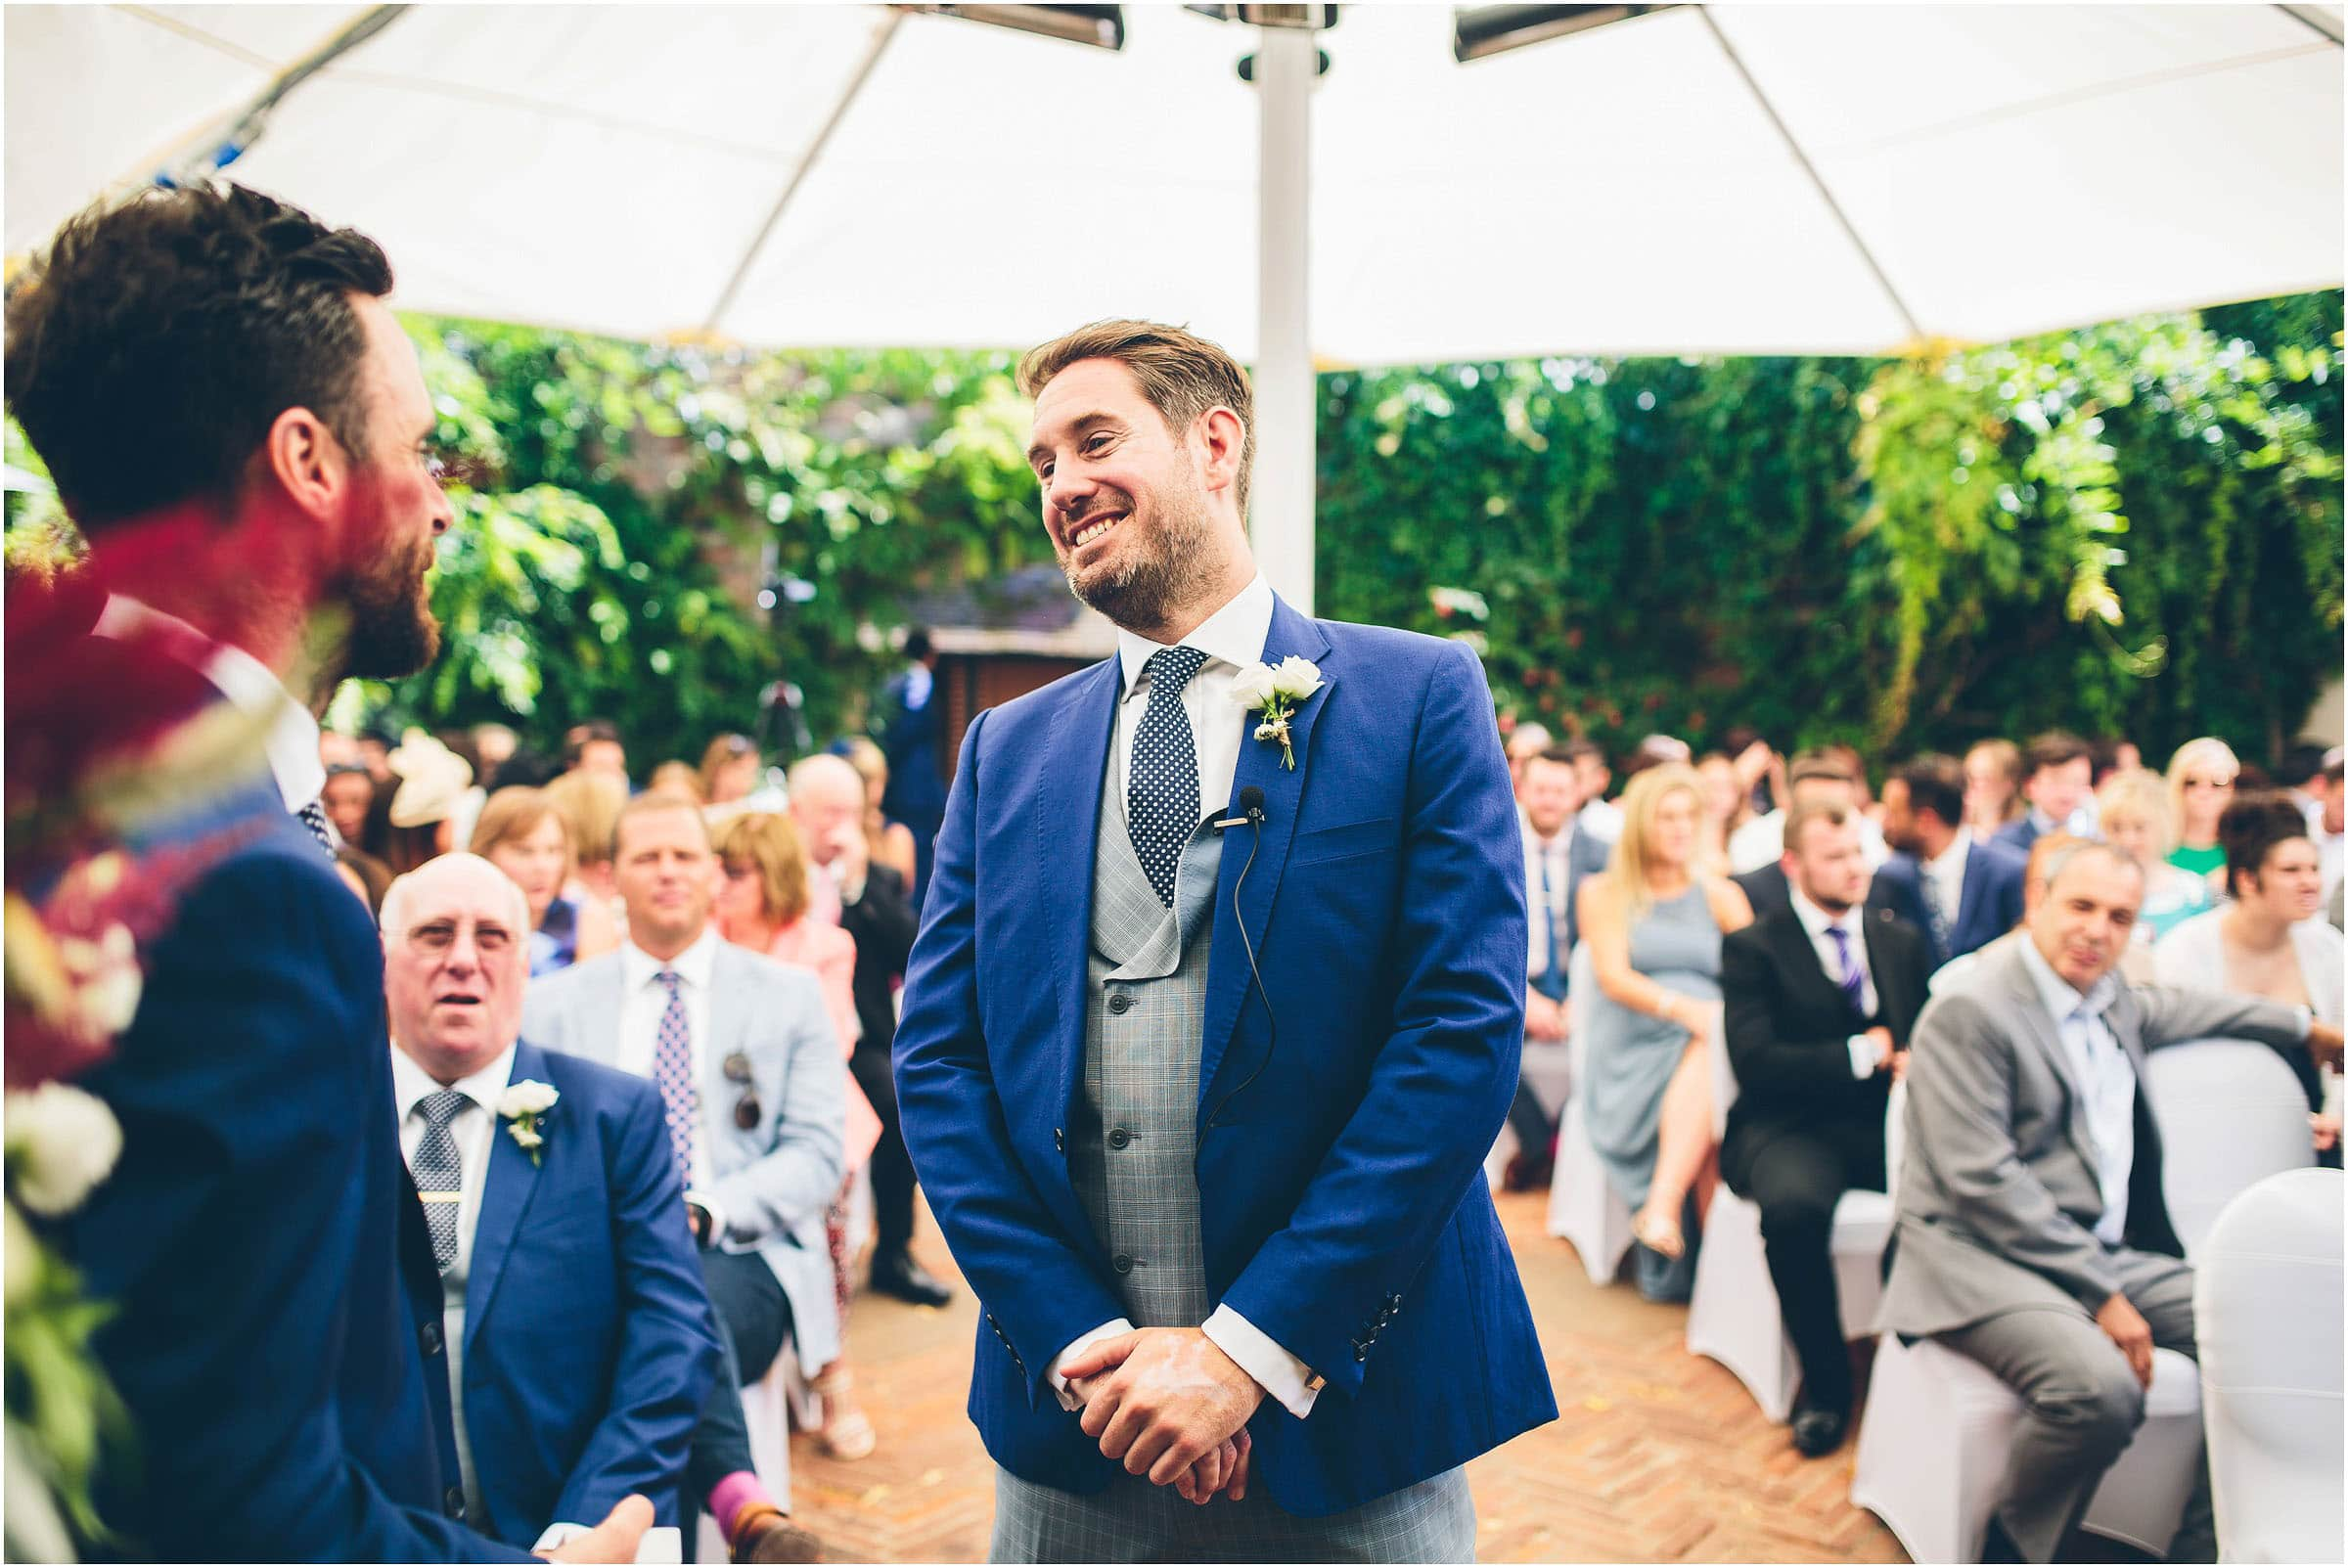 Kensington_Roof_Gardens_Wedding_Photography_0024